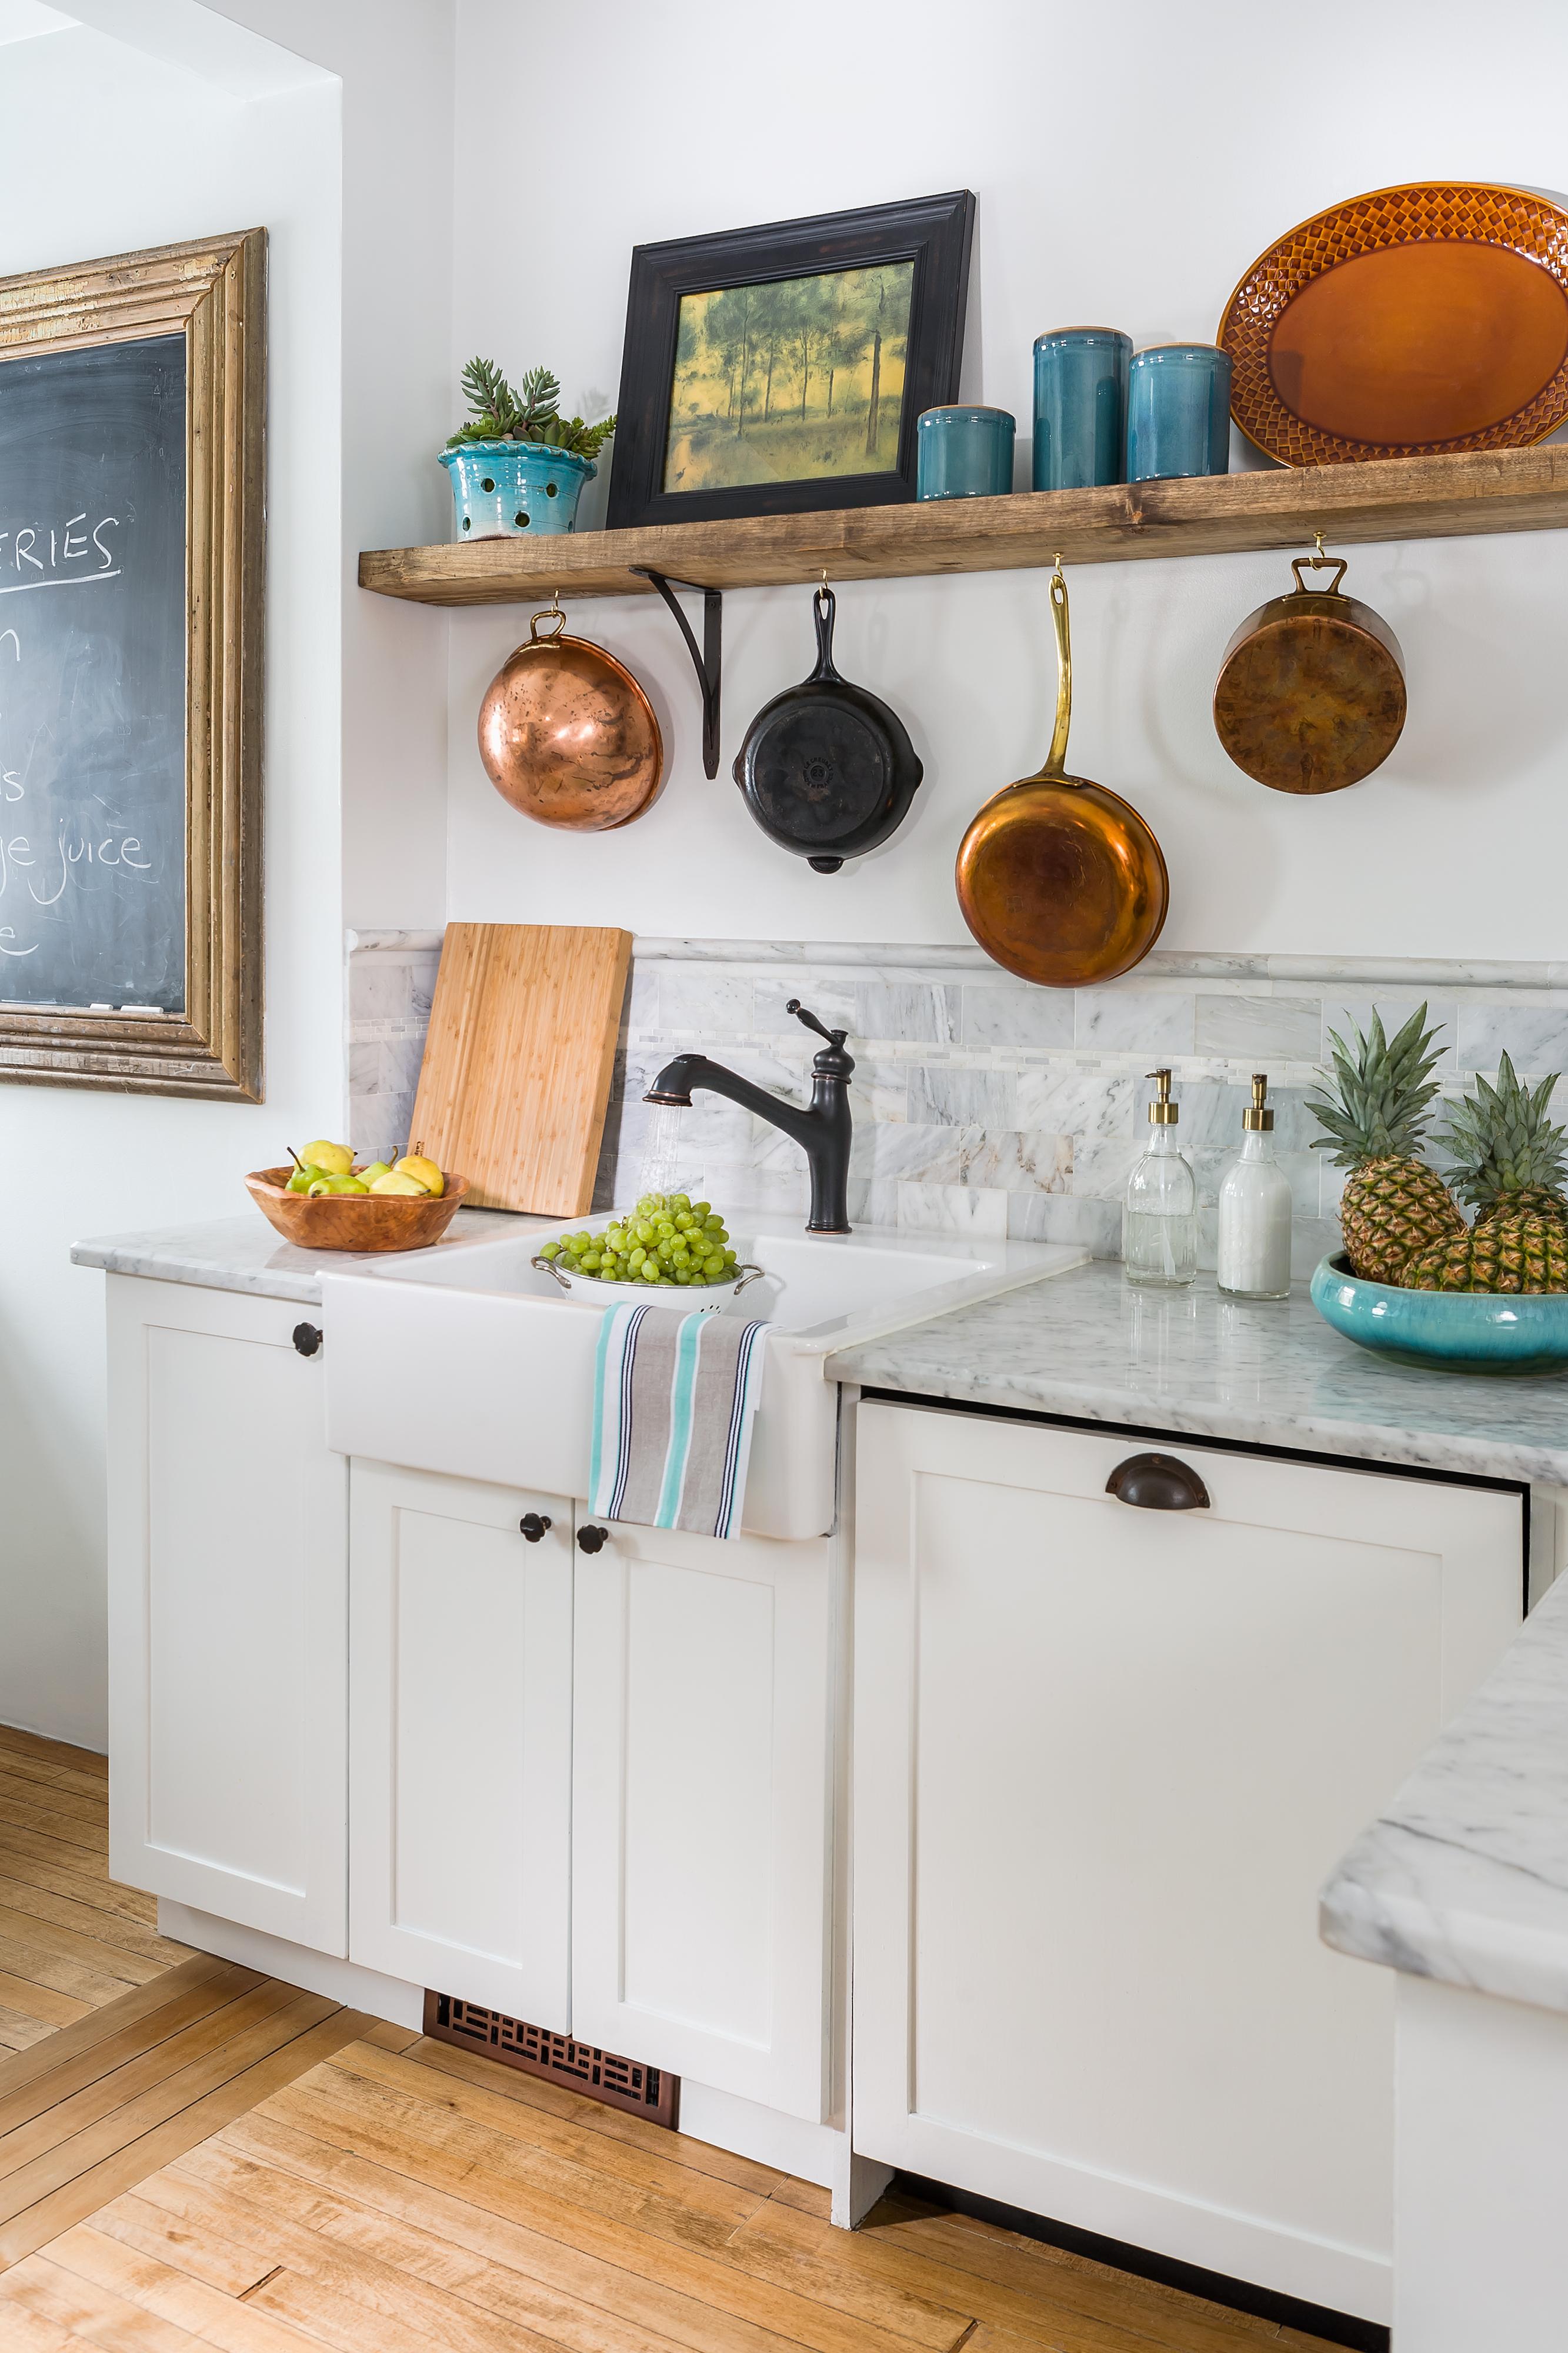 Copper Pots in Kitchen